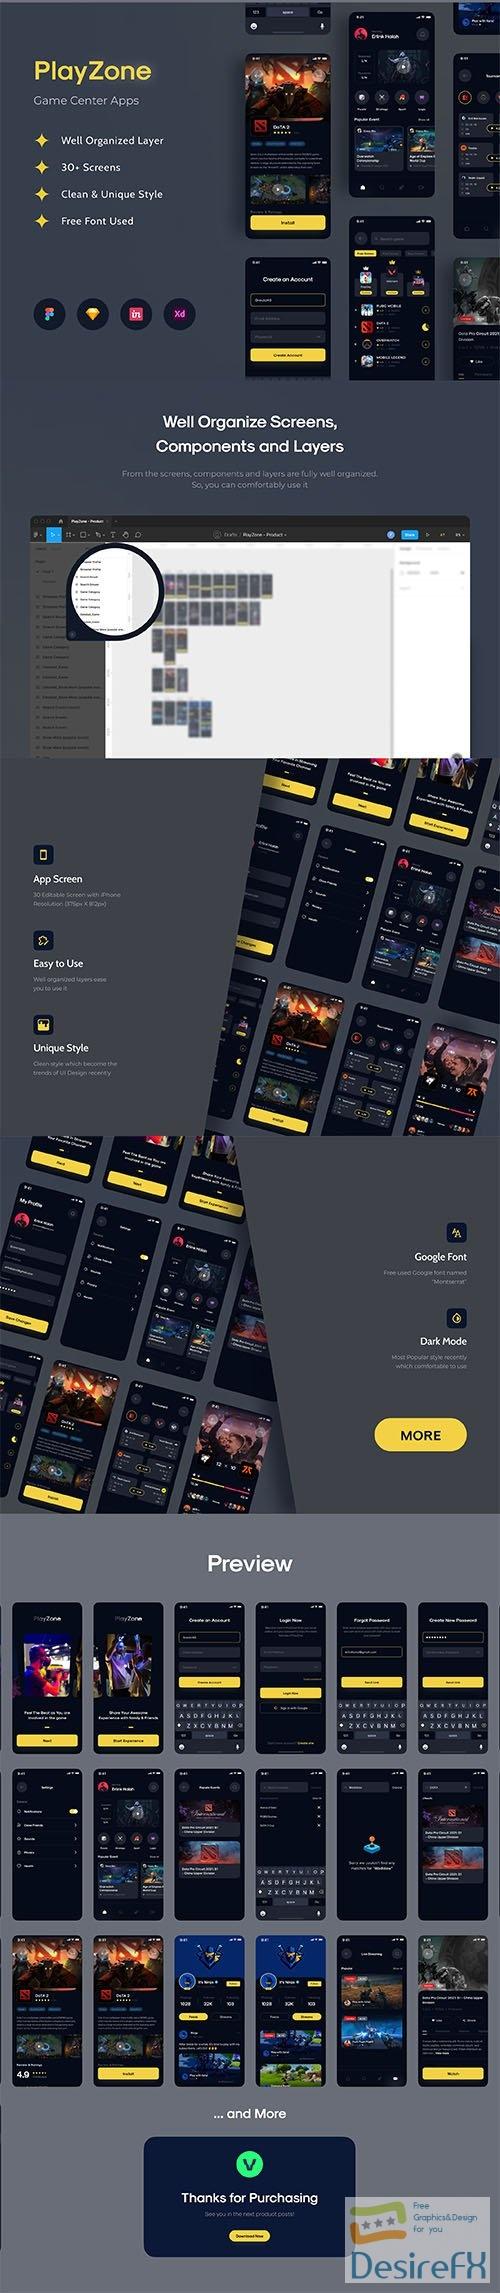 PlayZone - Game Center Apps UI KIT - UI8